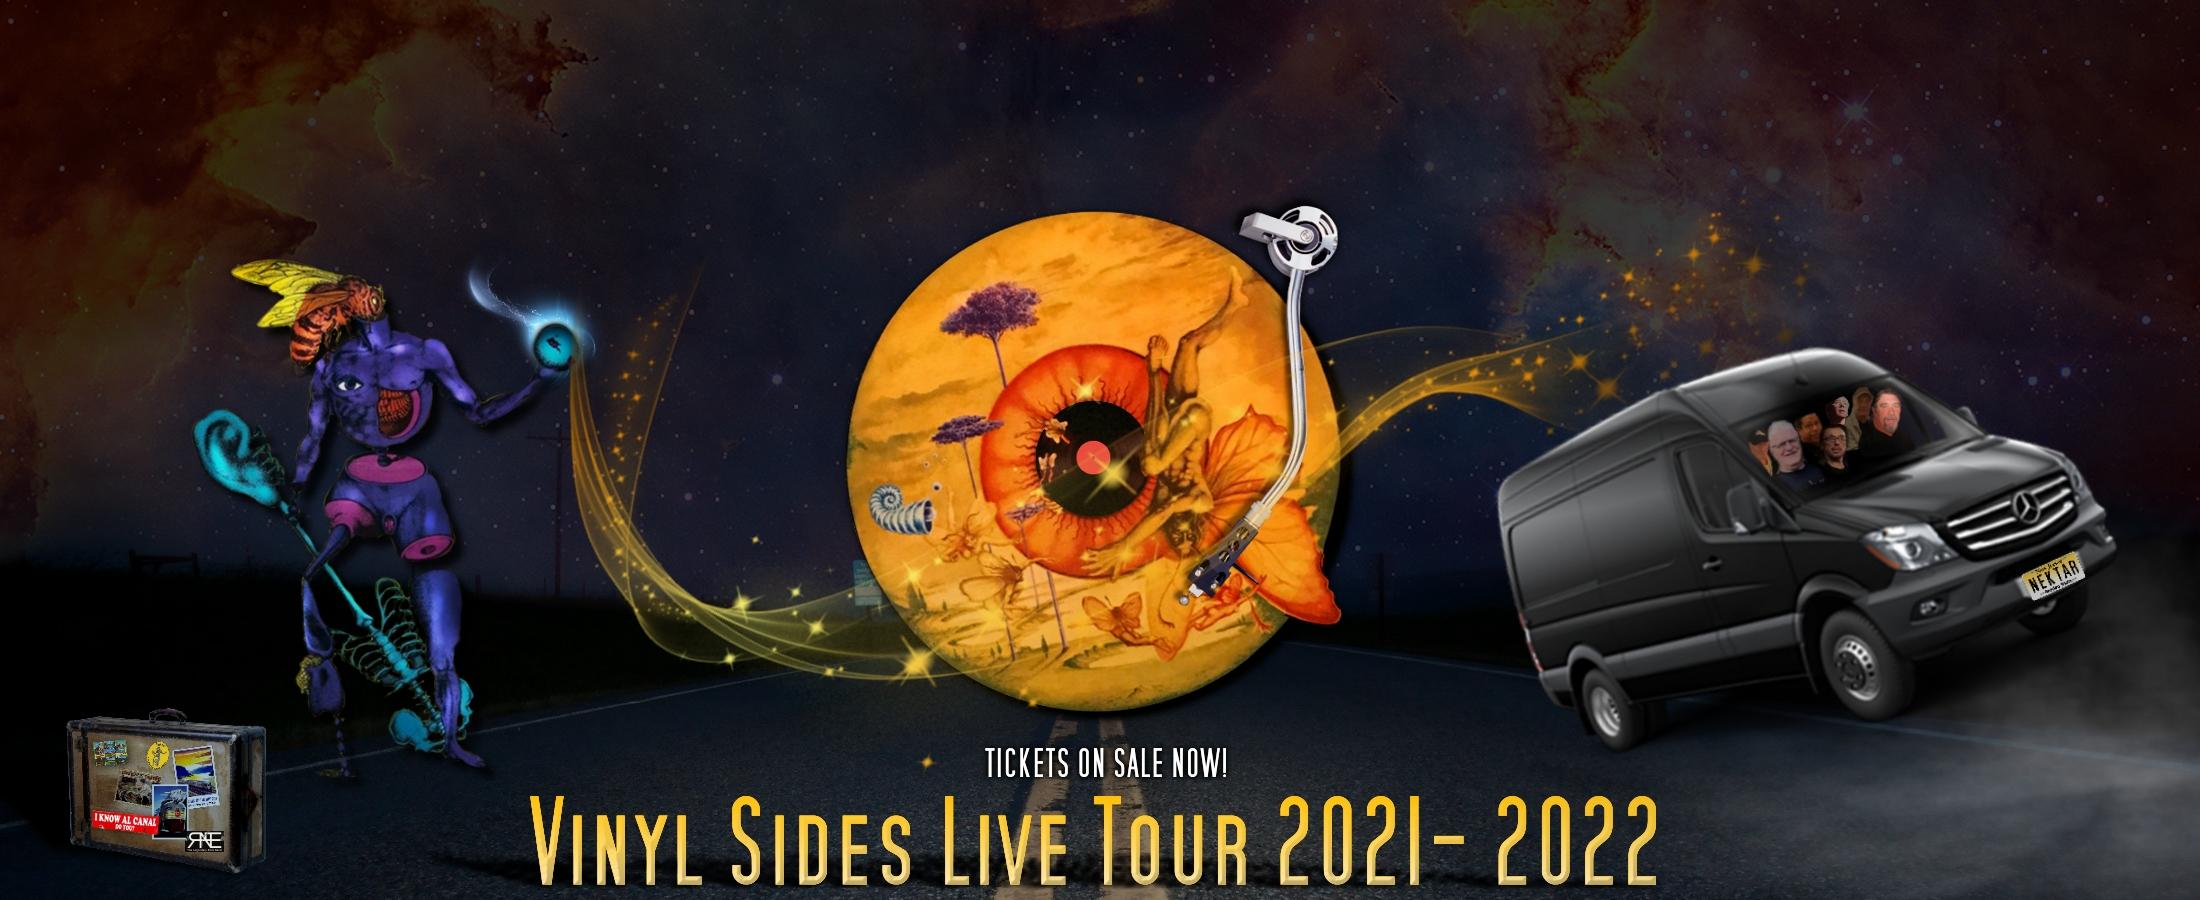 Nektar tour 2021-2022 vinyl sides live